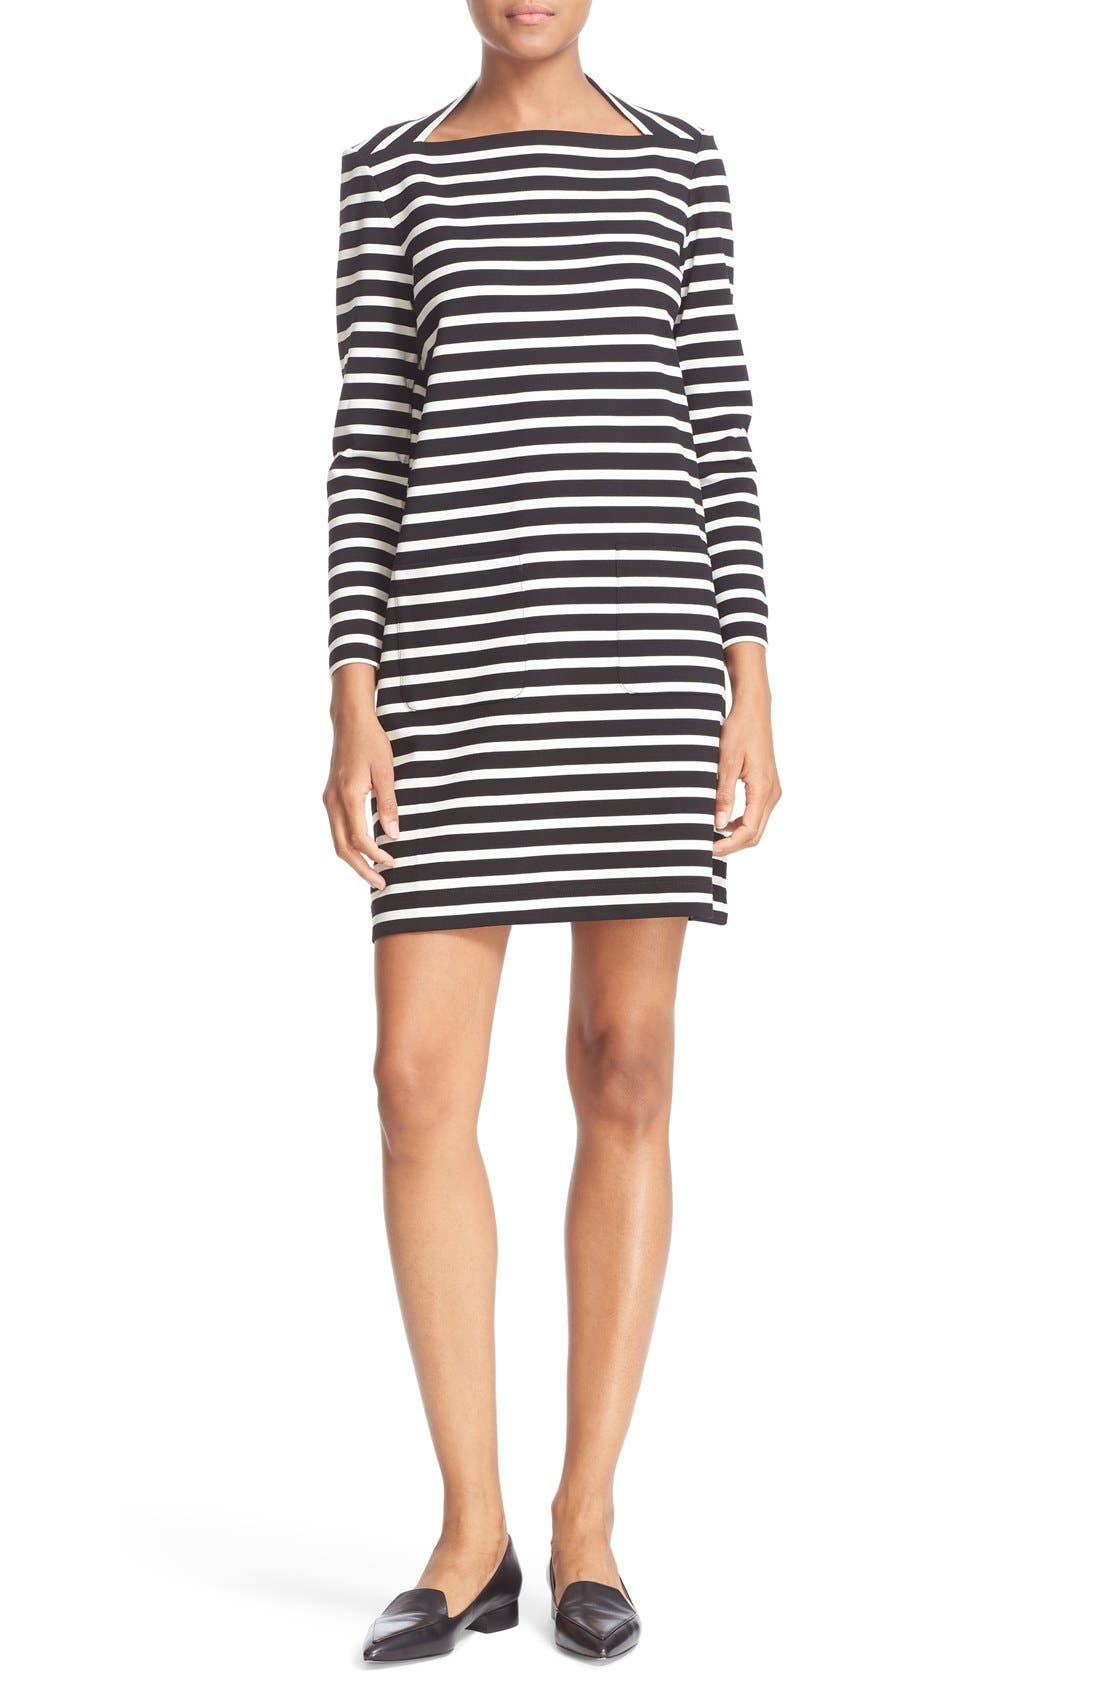 Alternate Image 1 Selected - kate spade new york 'everyday' stripe patch pocket shift dress